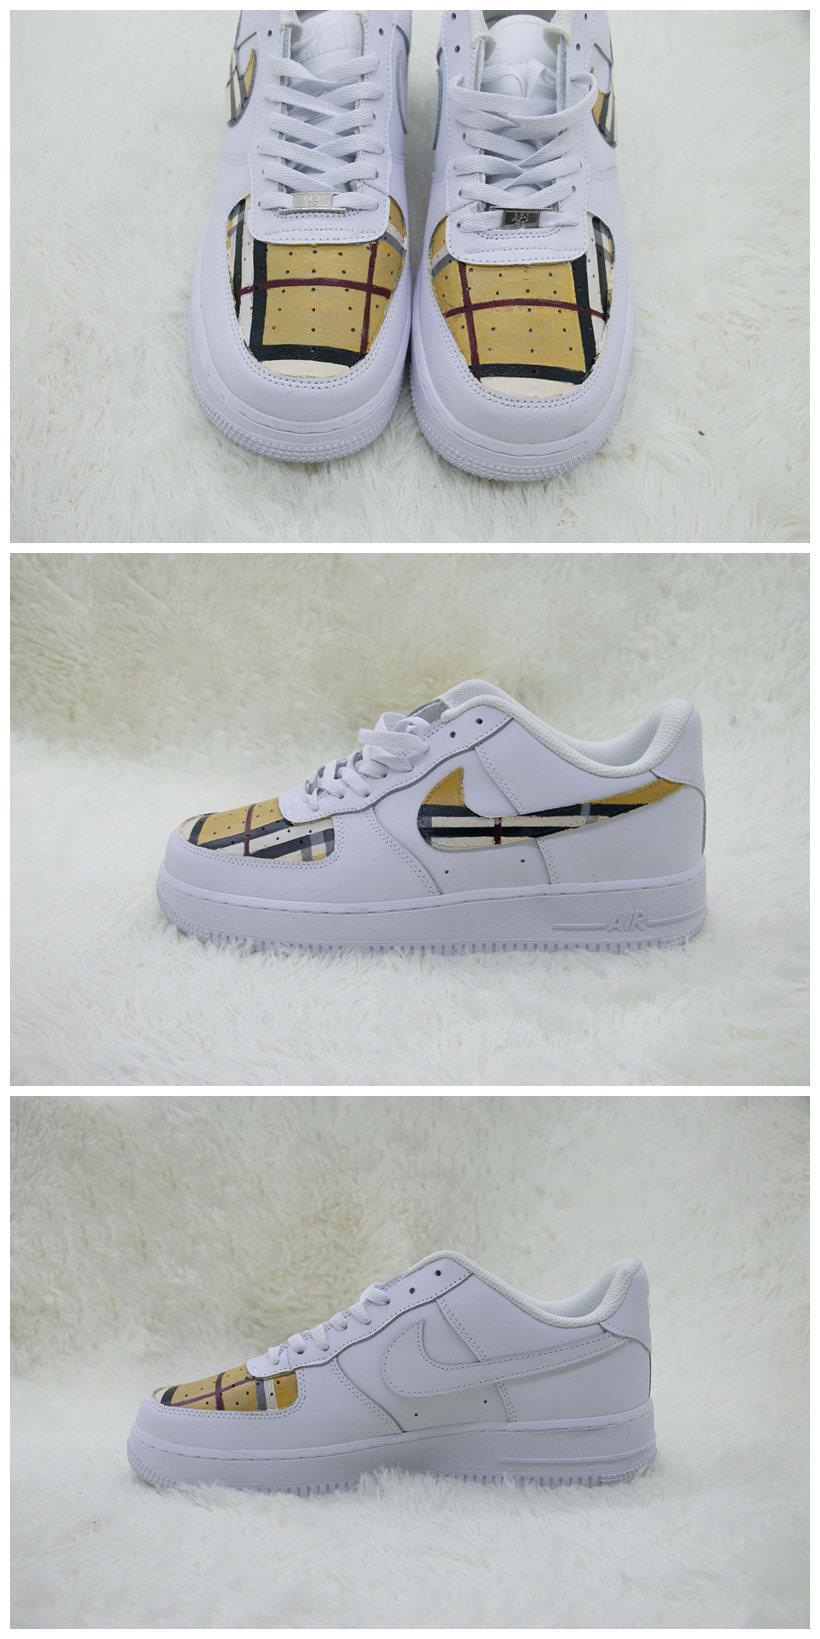 Custom Burberry Shoes For Air Force 1 White Graffiti Hand Painted Sneaker - A004Custom Burberry Shoes For Air Force 1 White Graffiti Hand Painted Sneaker - The Zero Custom